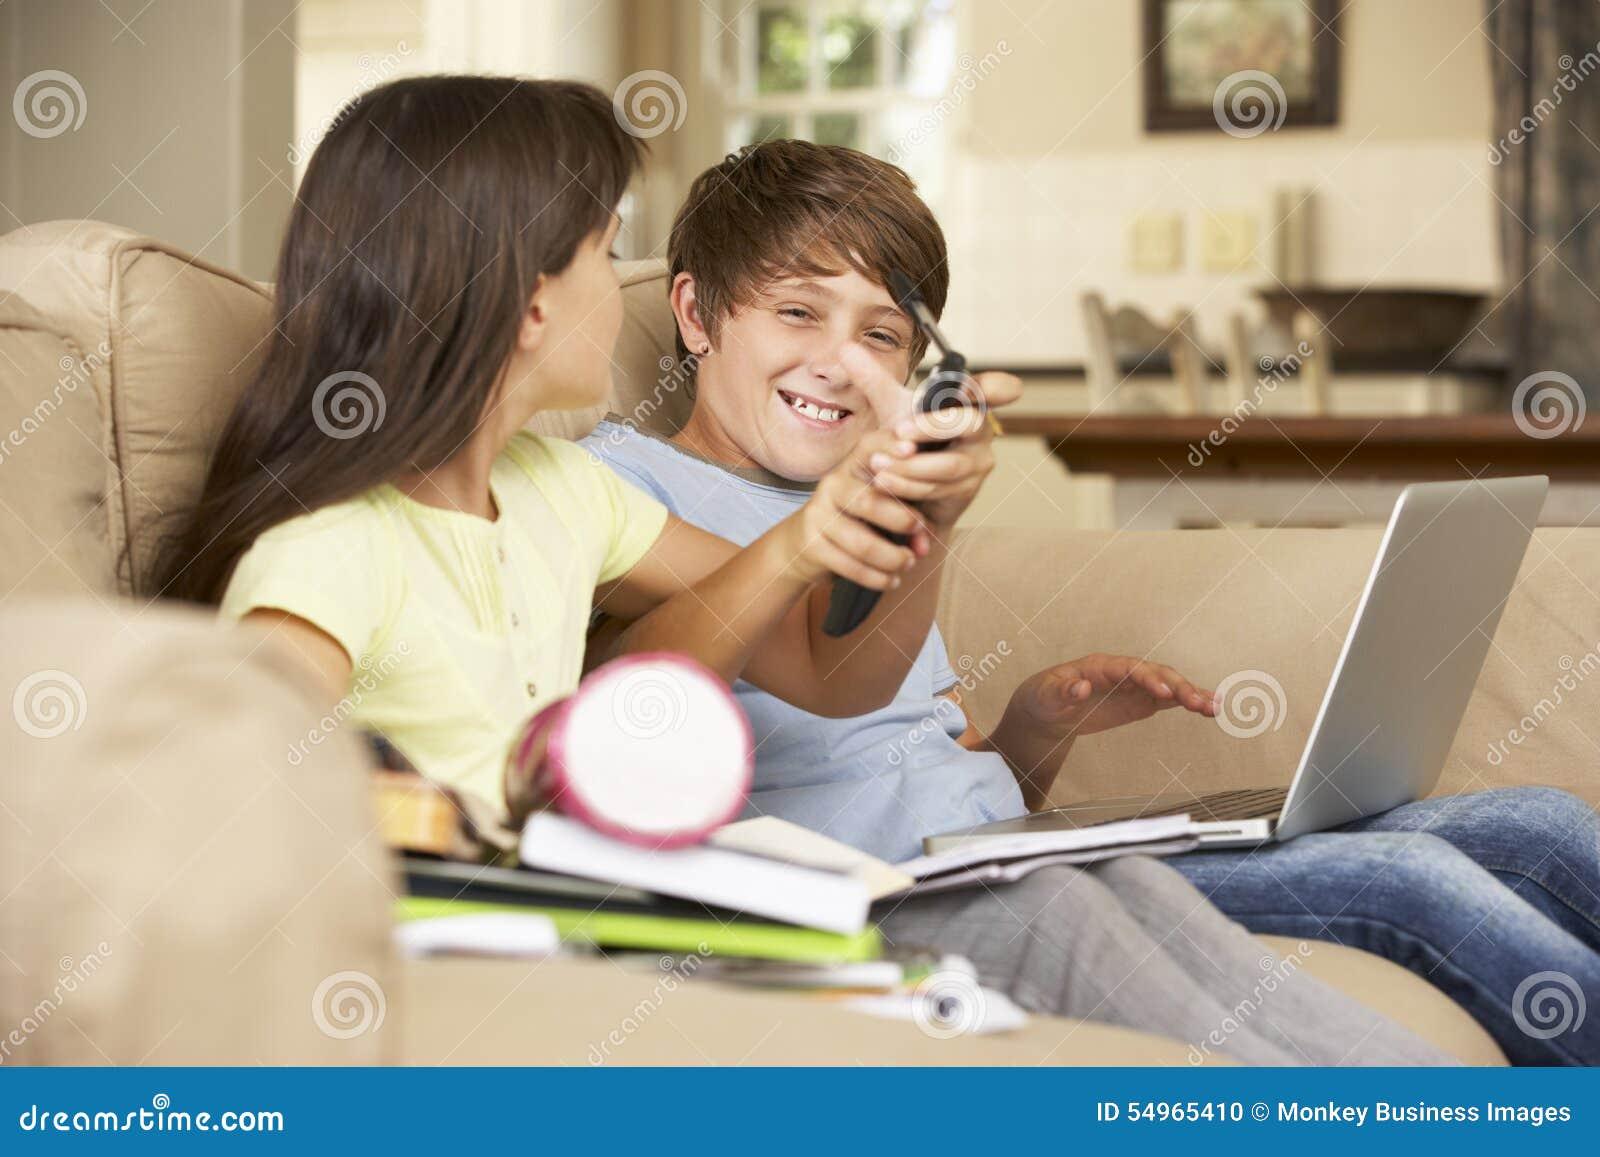 Distracted child homework